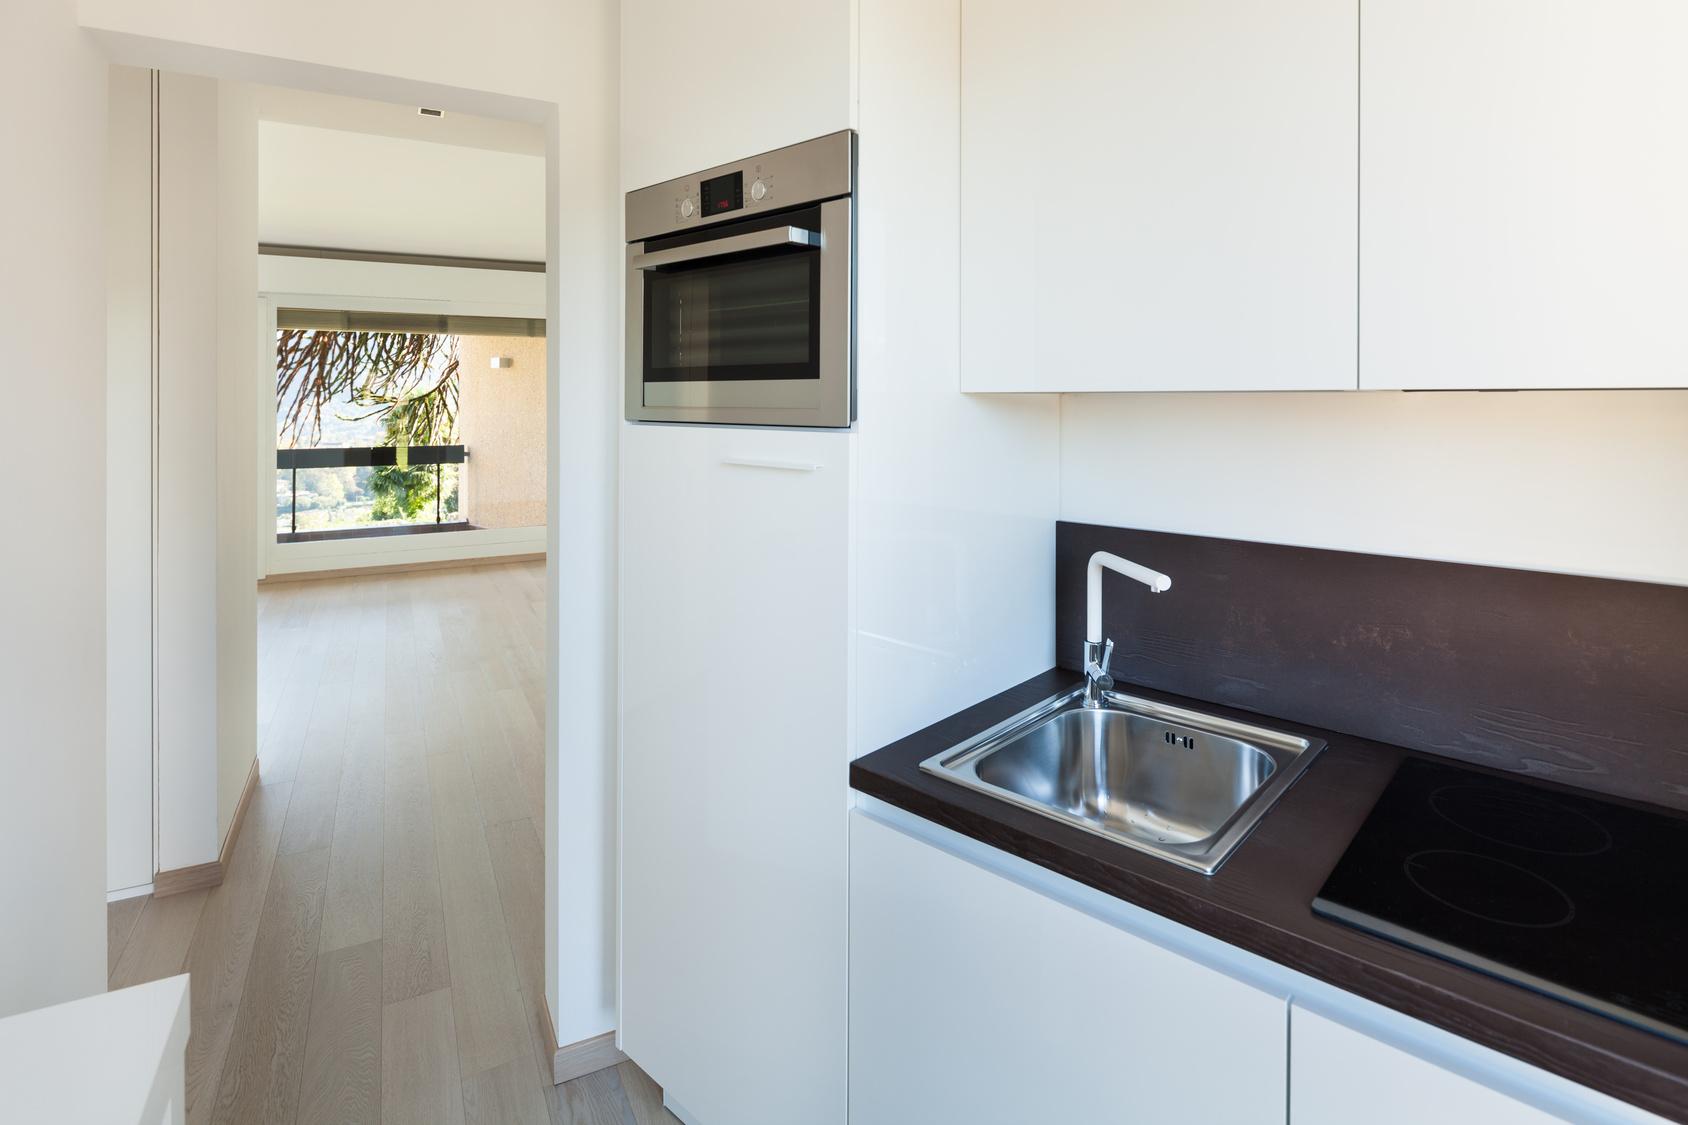 Full Size of Interiors Building, Modern Apartment, Kitchen View Küche Mini Küche